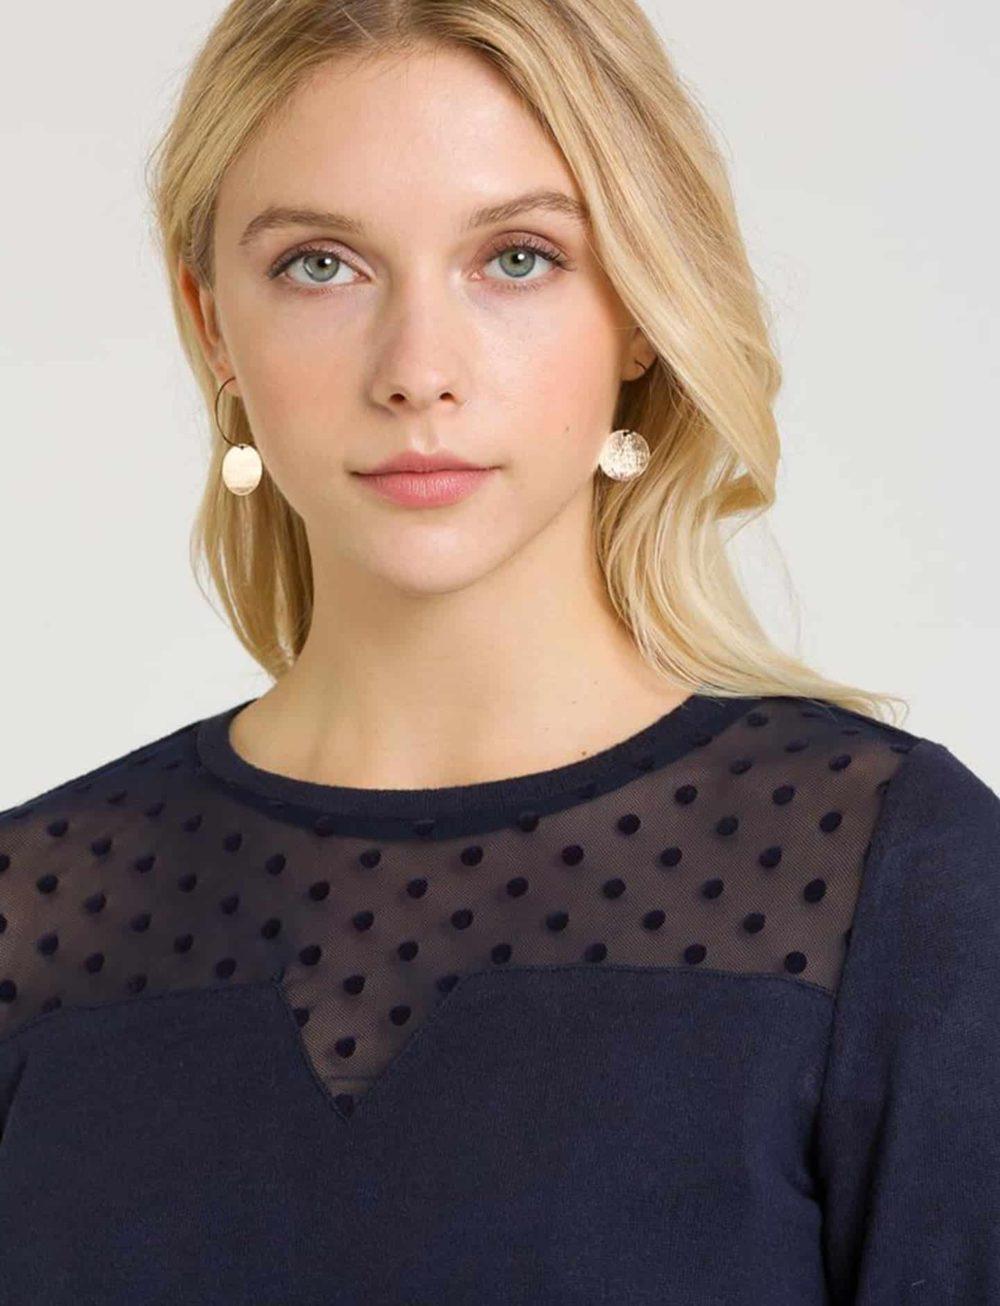 camiseta-combinada-transparencias-azul-marino-detalle